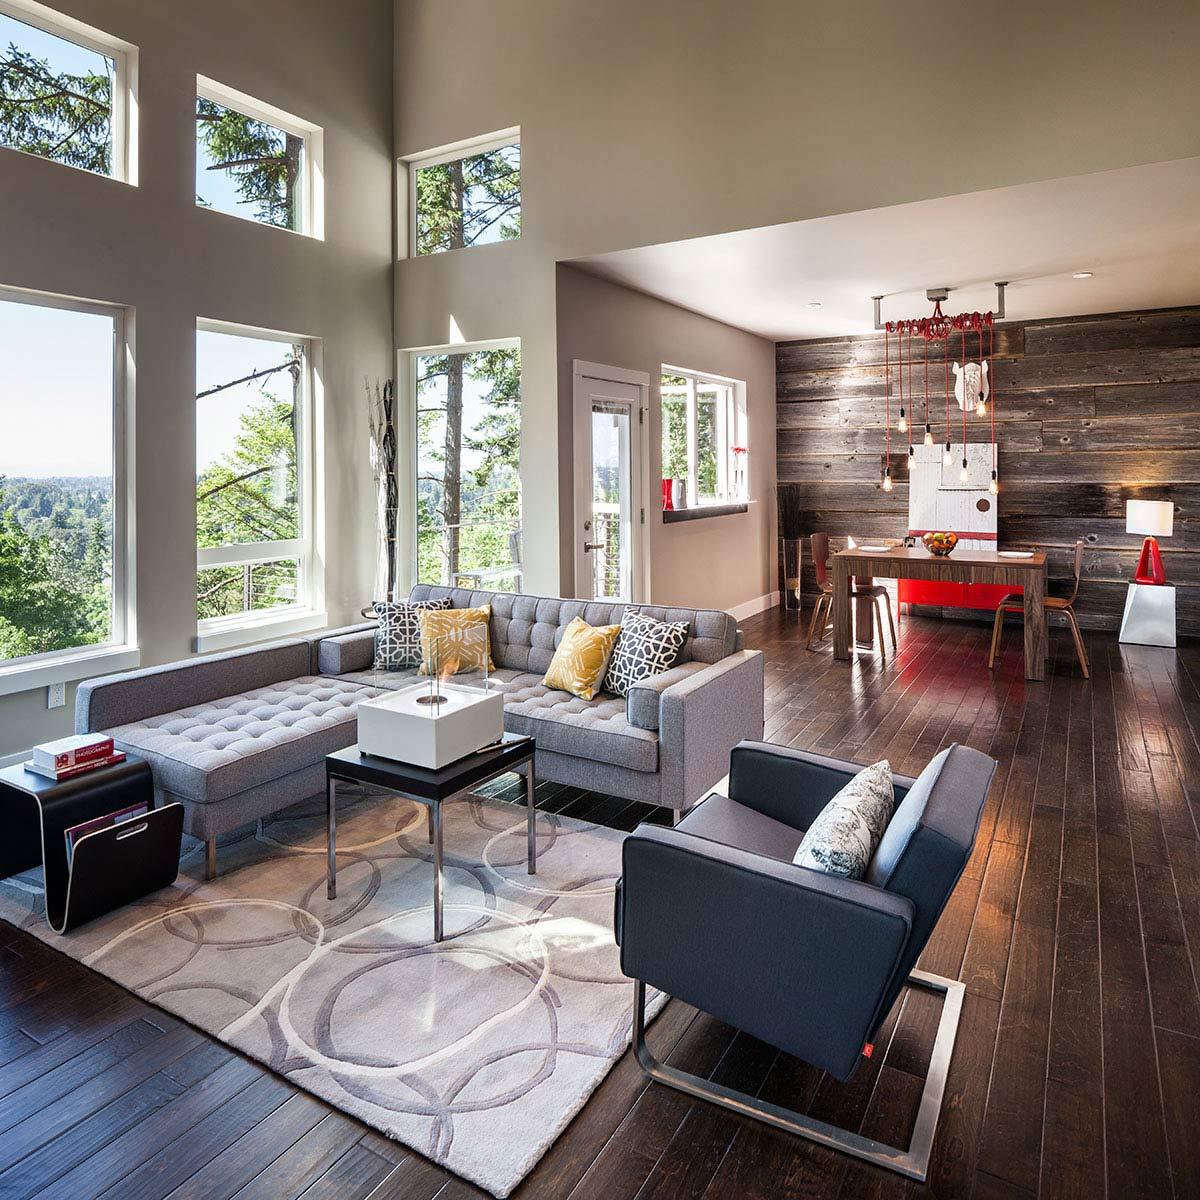 Open Plan Dining, Living, Modern Home in Eugene, Oregon by Jordan Iverson Signature Homes